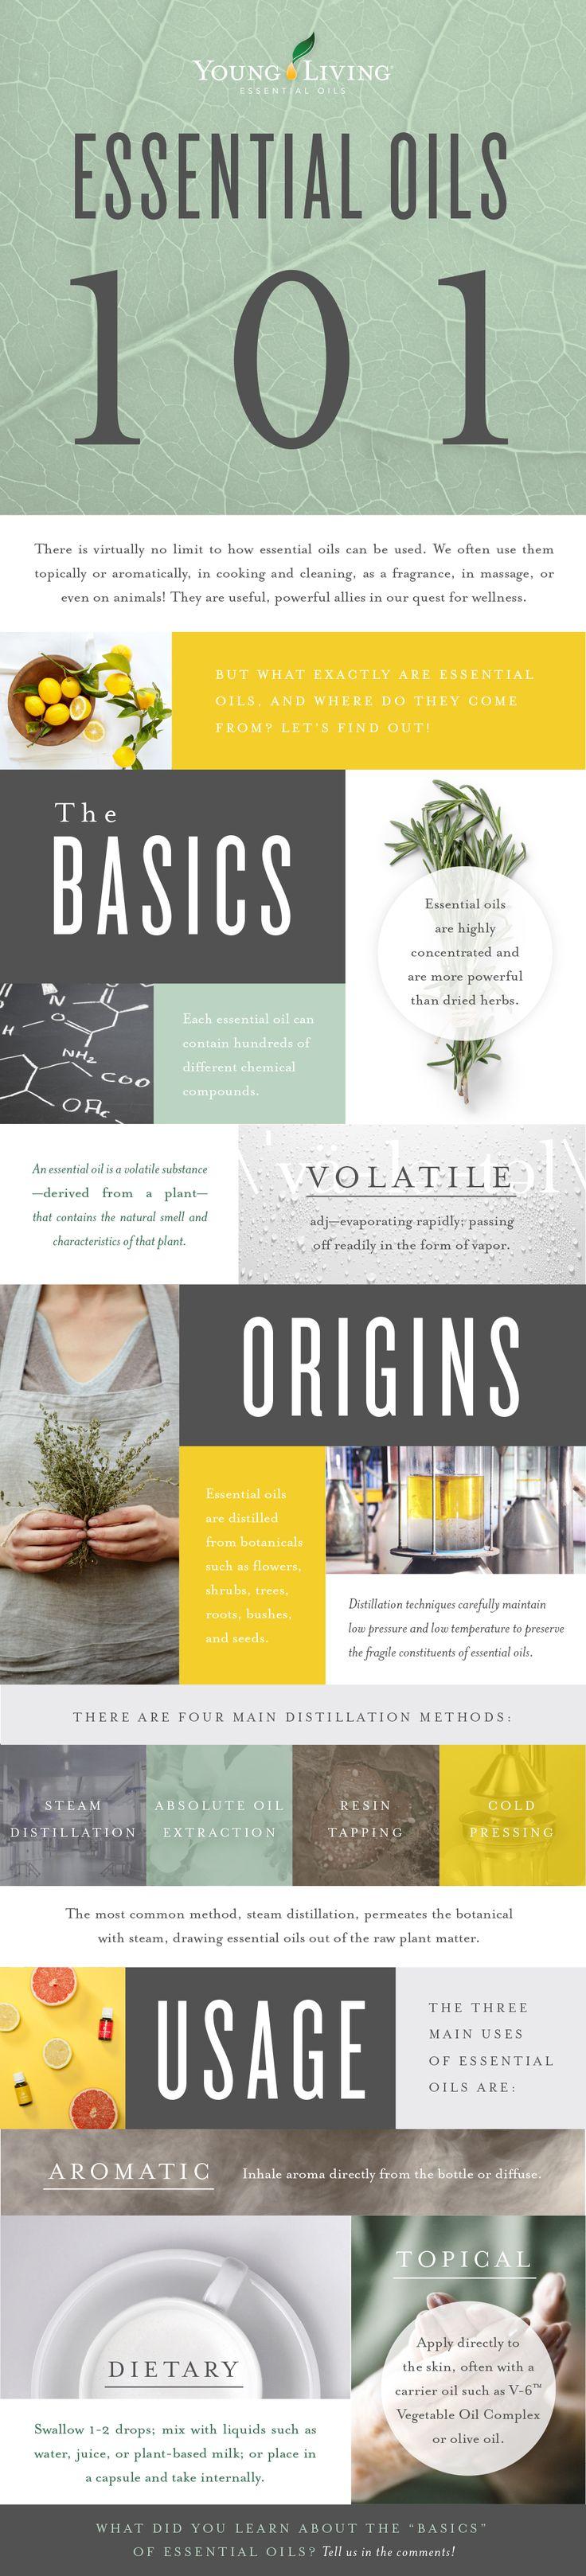 Essential Oils 101: The Basics